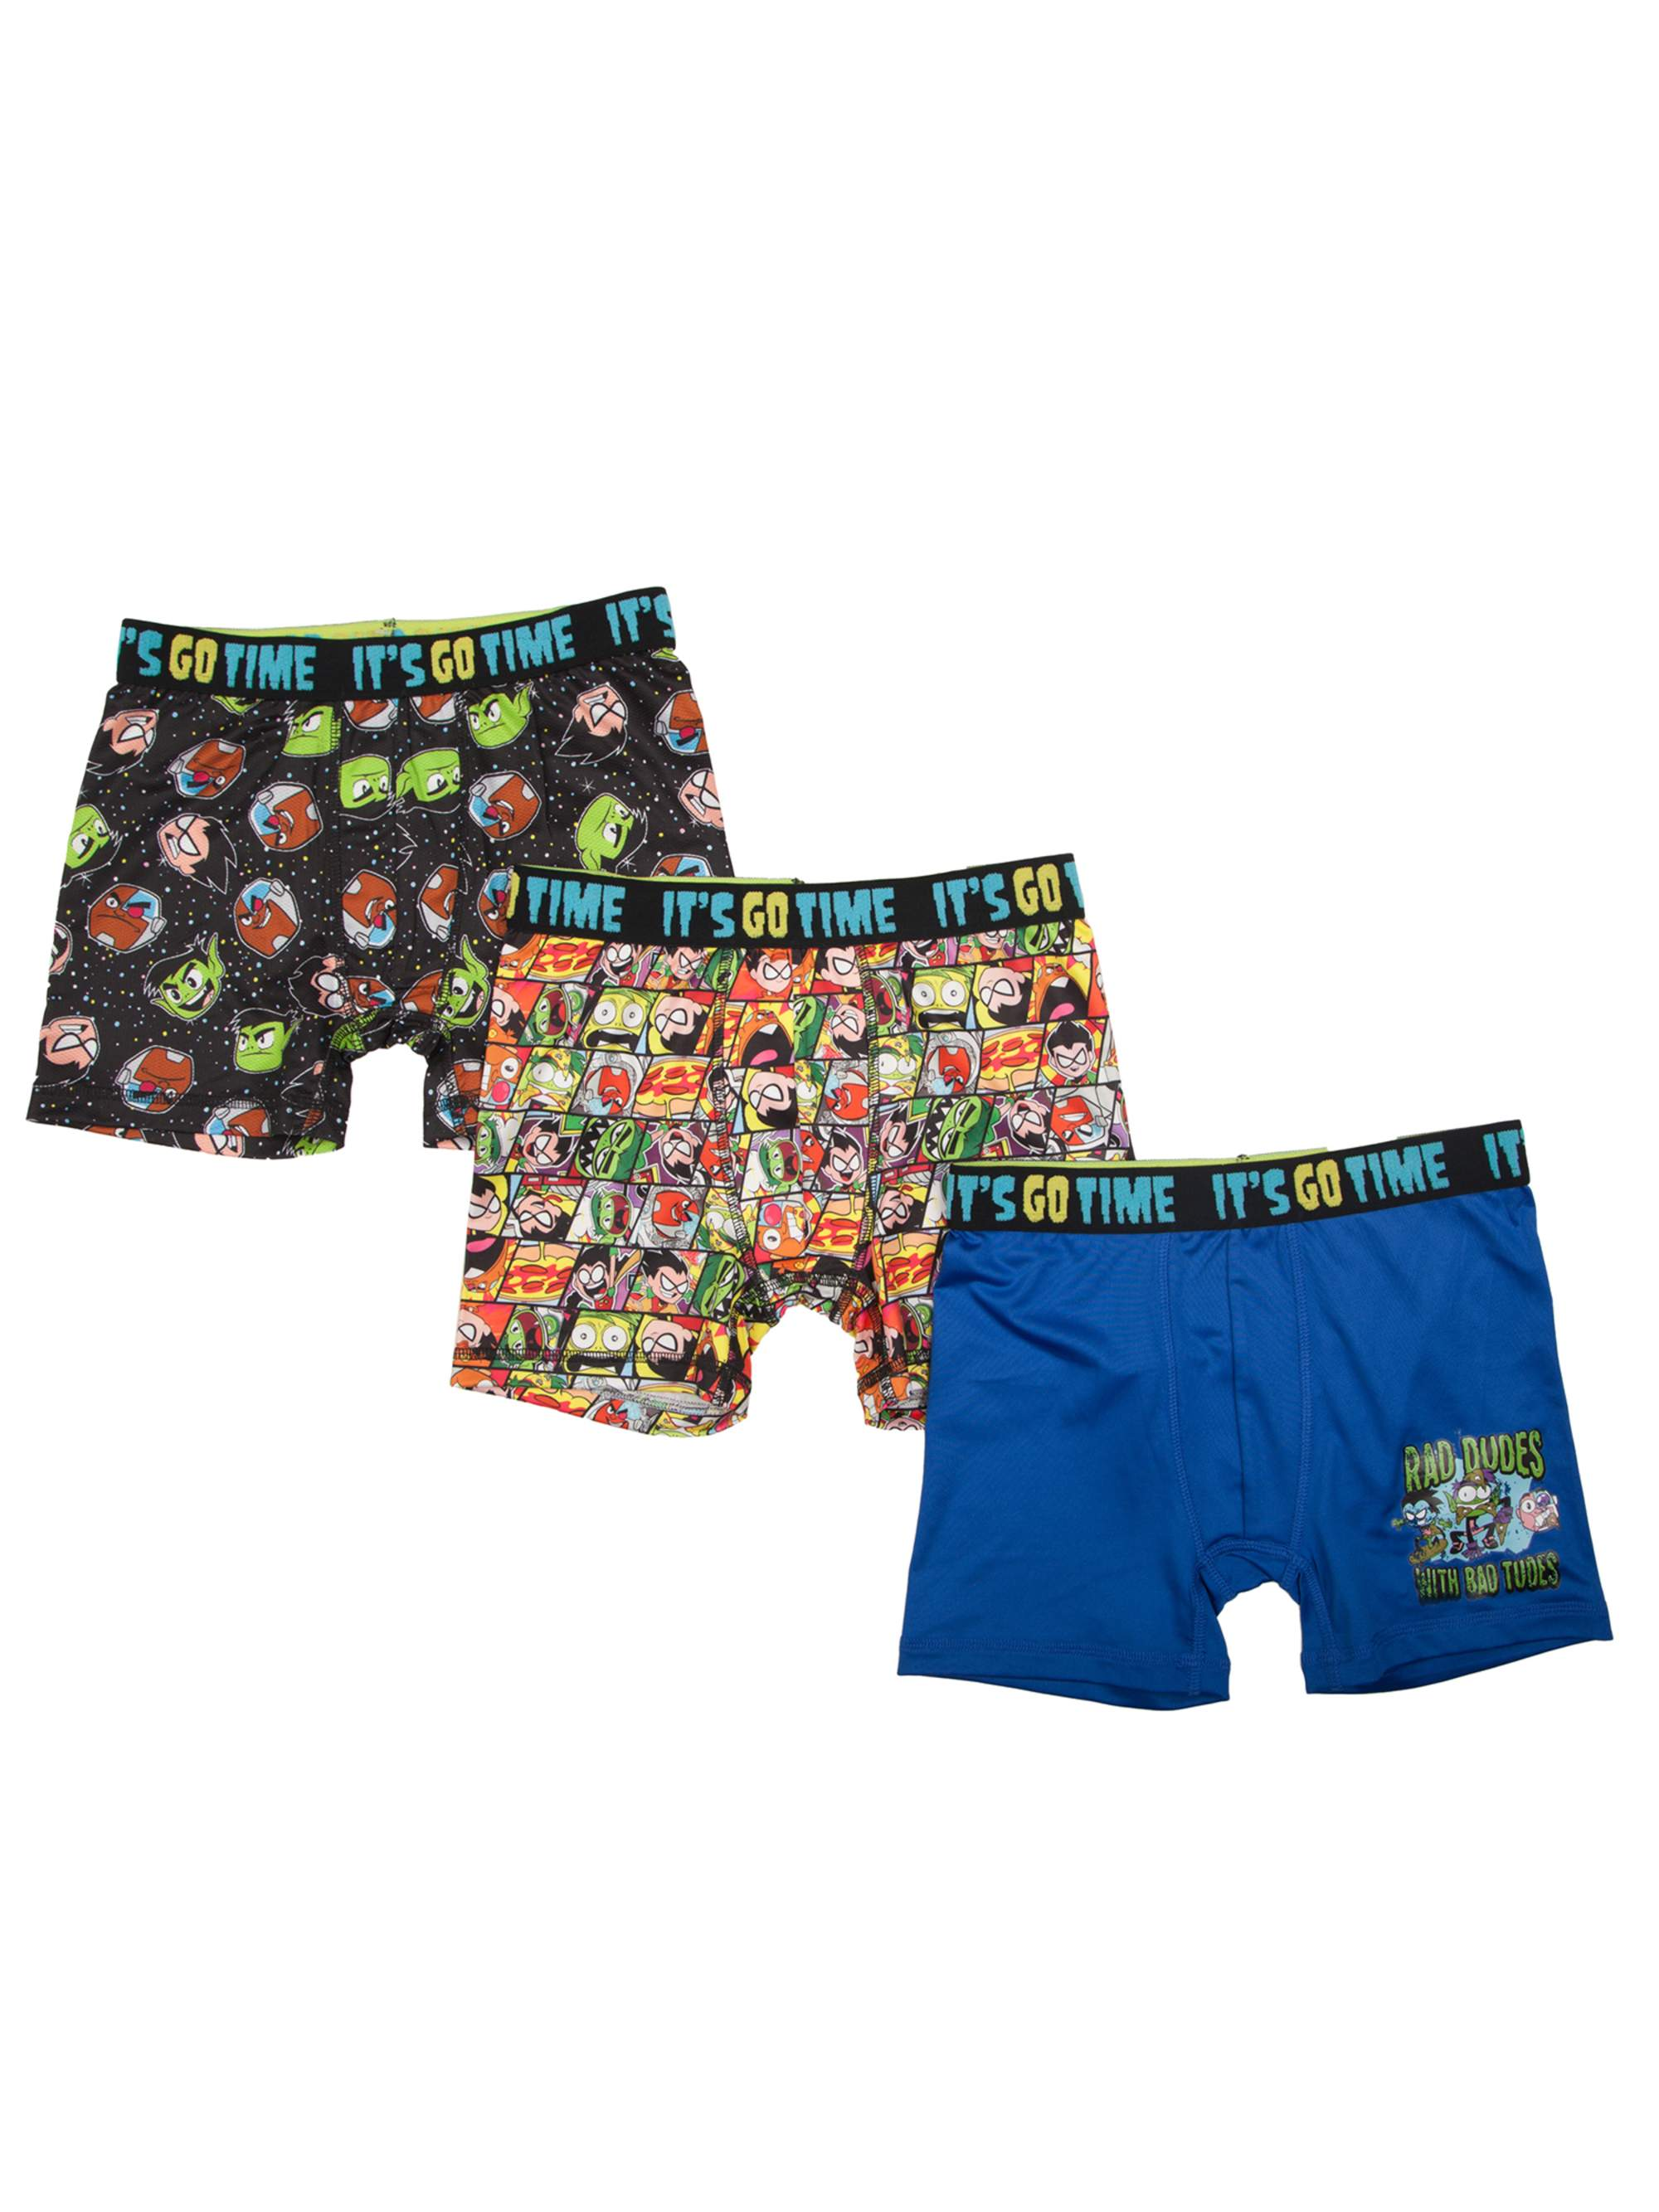 Teen Titans Boy's Poly Boxer Briefs, 3 Pack